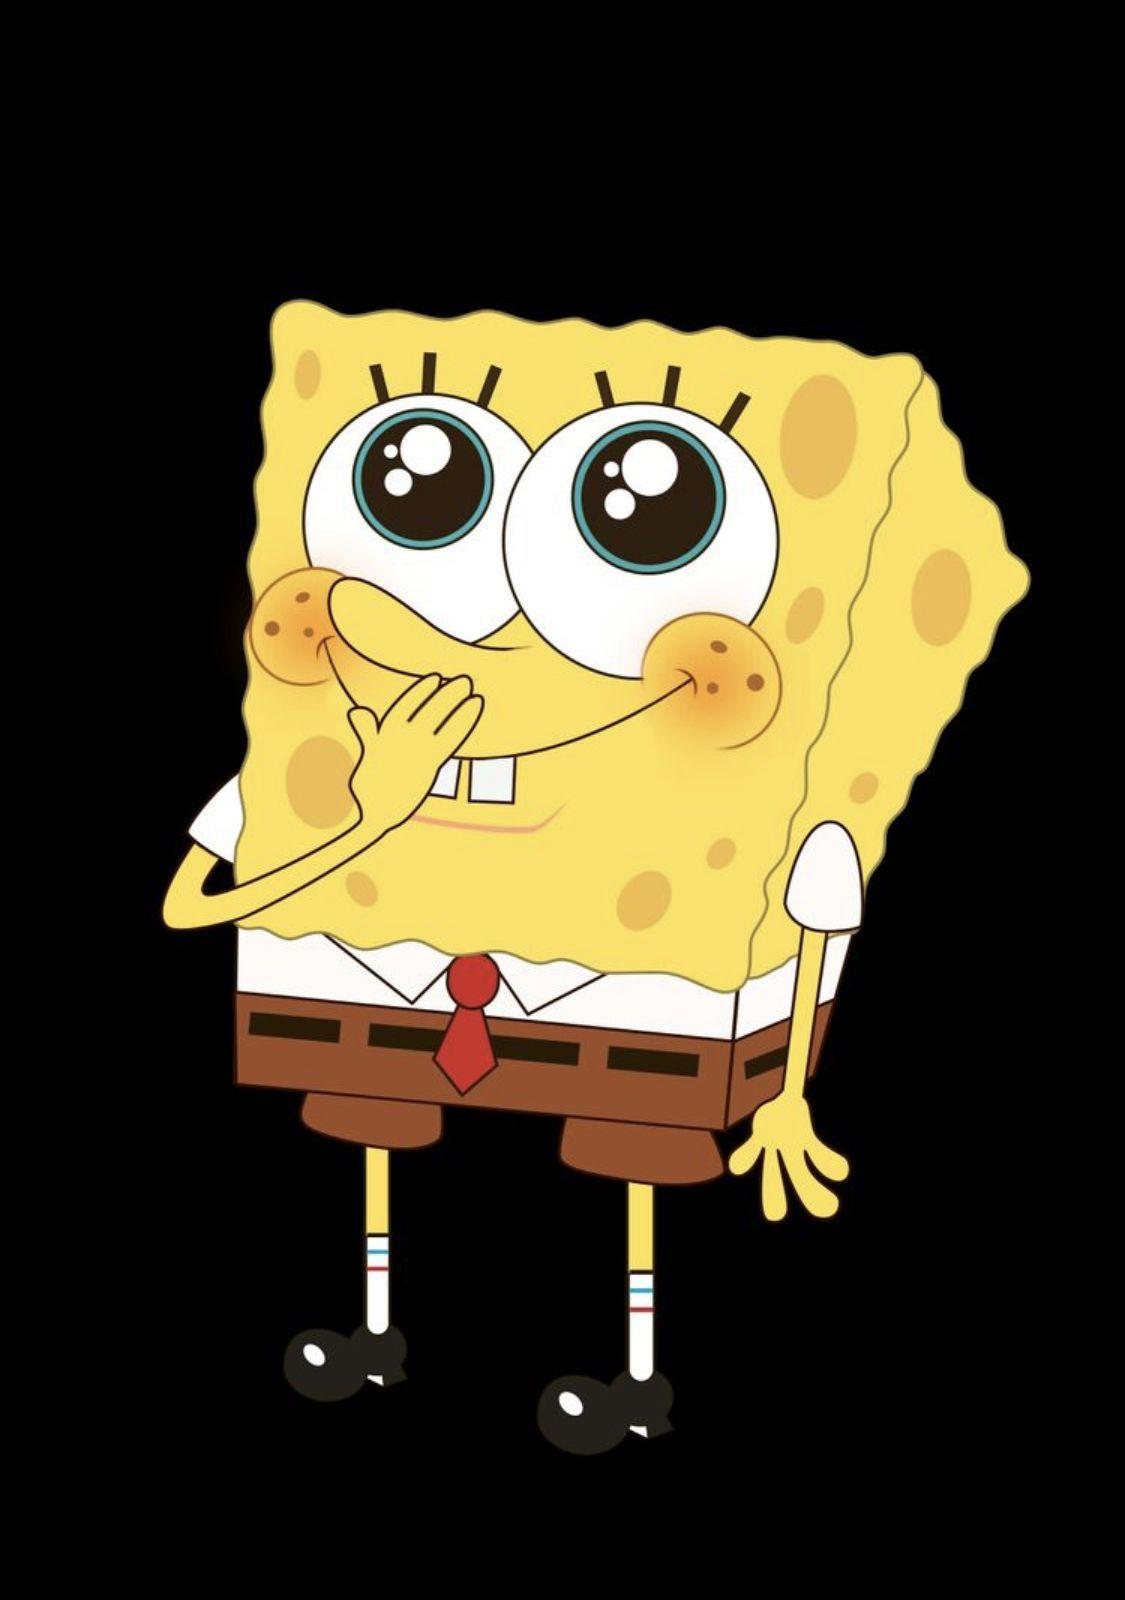 Wallpaper Kartun Spongebob